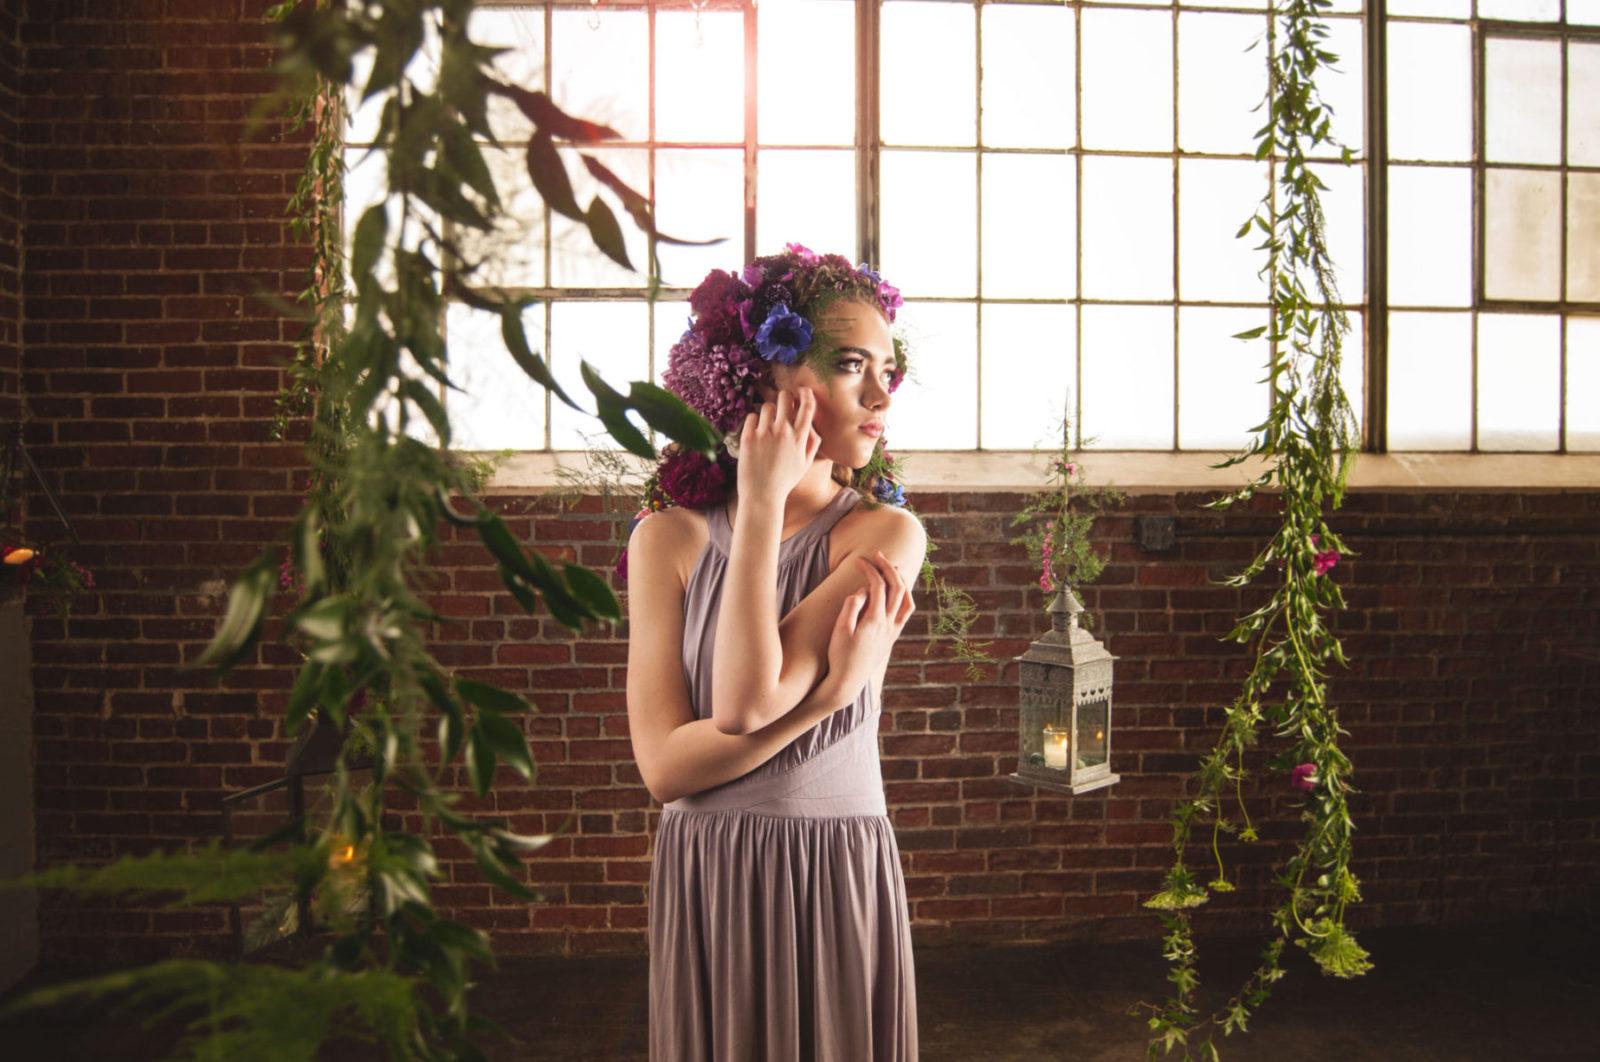 SecretGarden.OrchidPrincess.KJeanPhotography.web-8